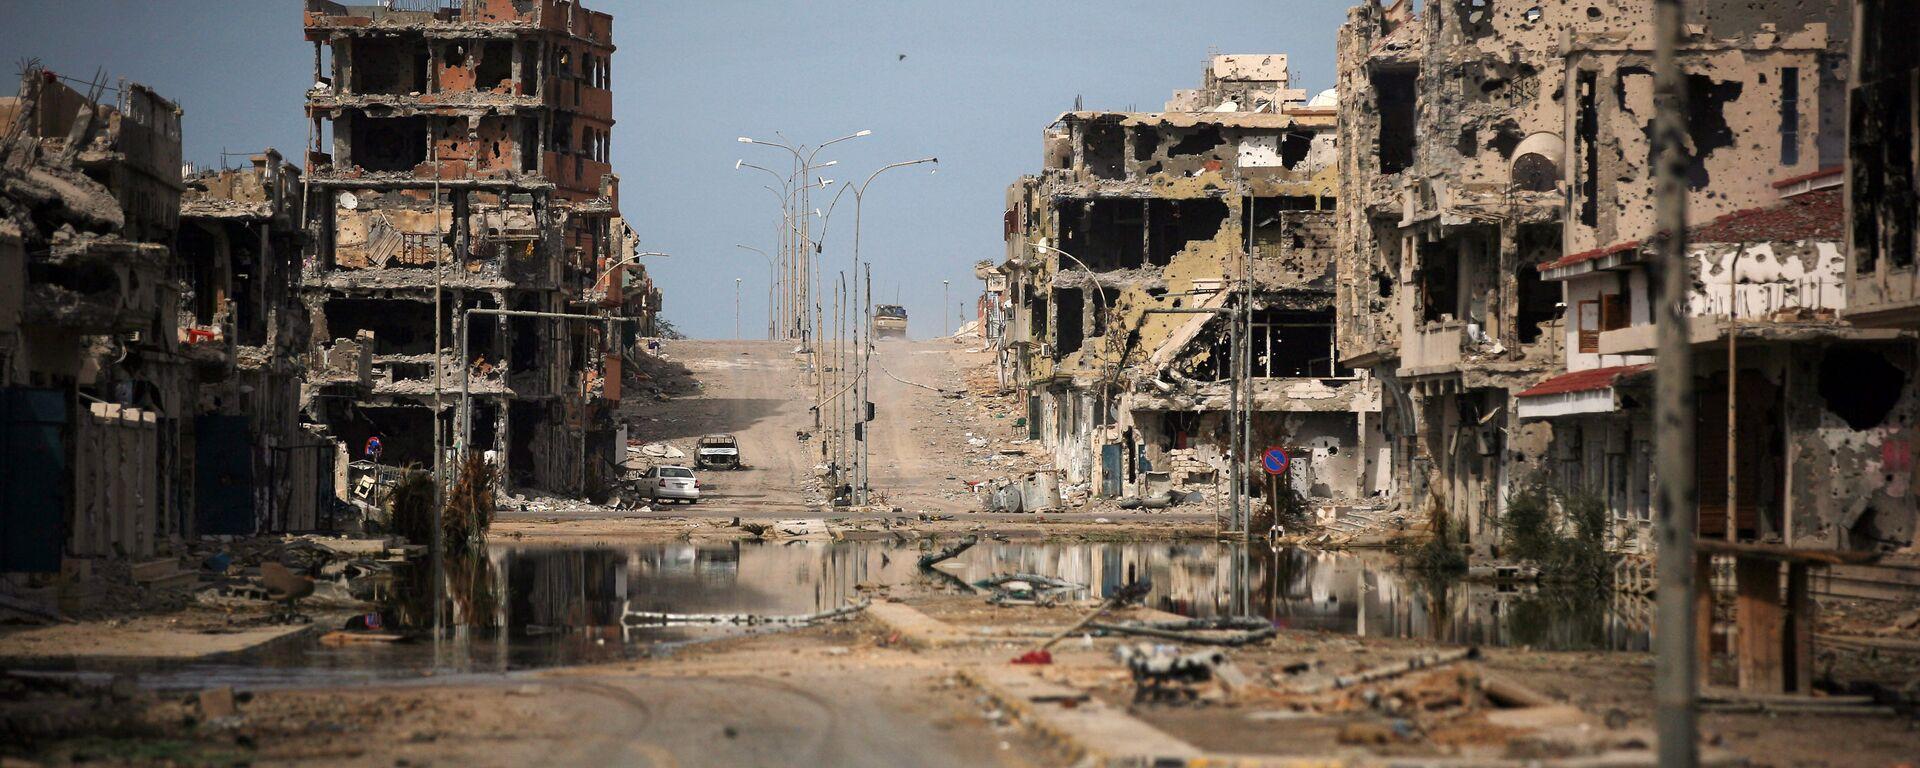 Las ruinas en la ciudad libia de Sirte - Sputnik Mundo, 1920, 23.06.2021